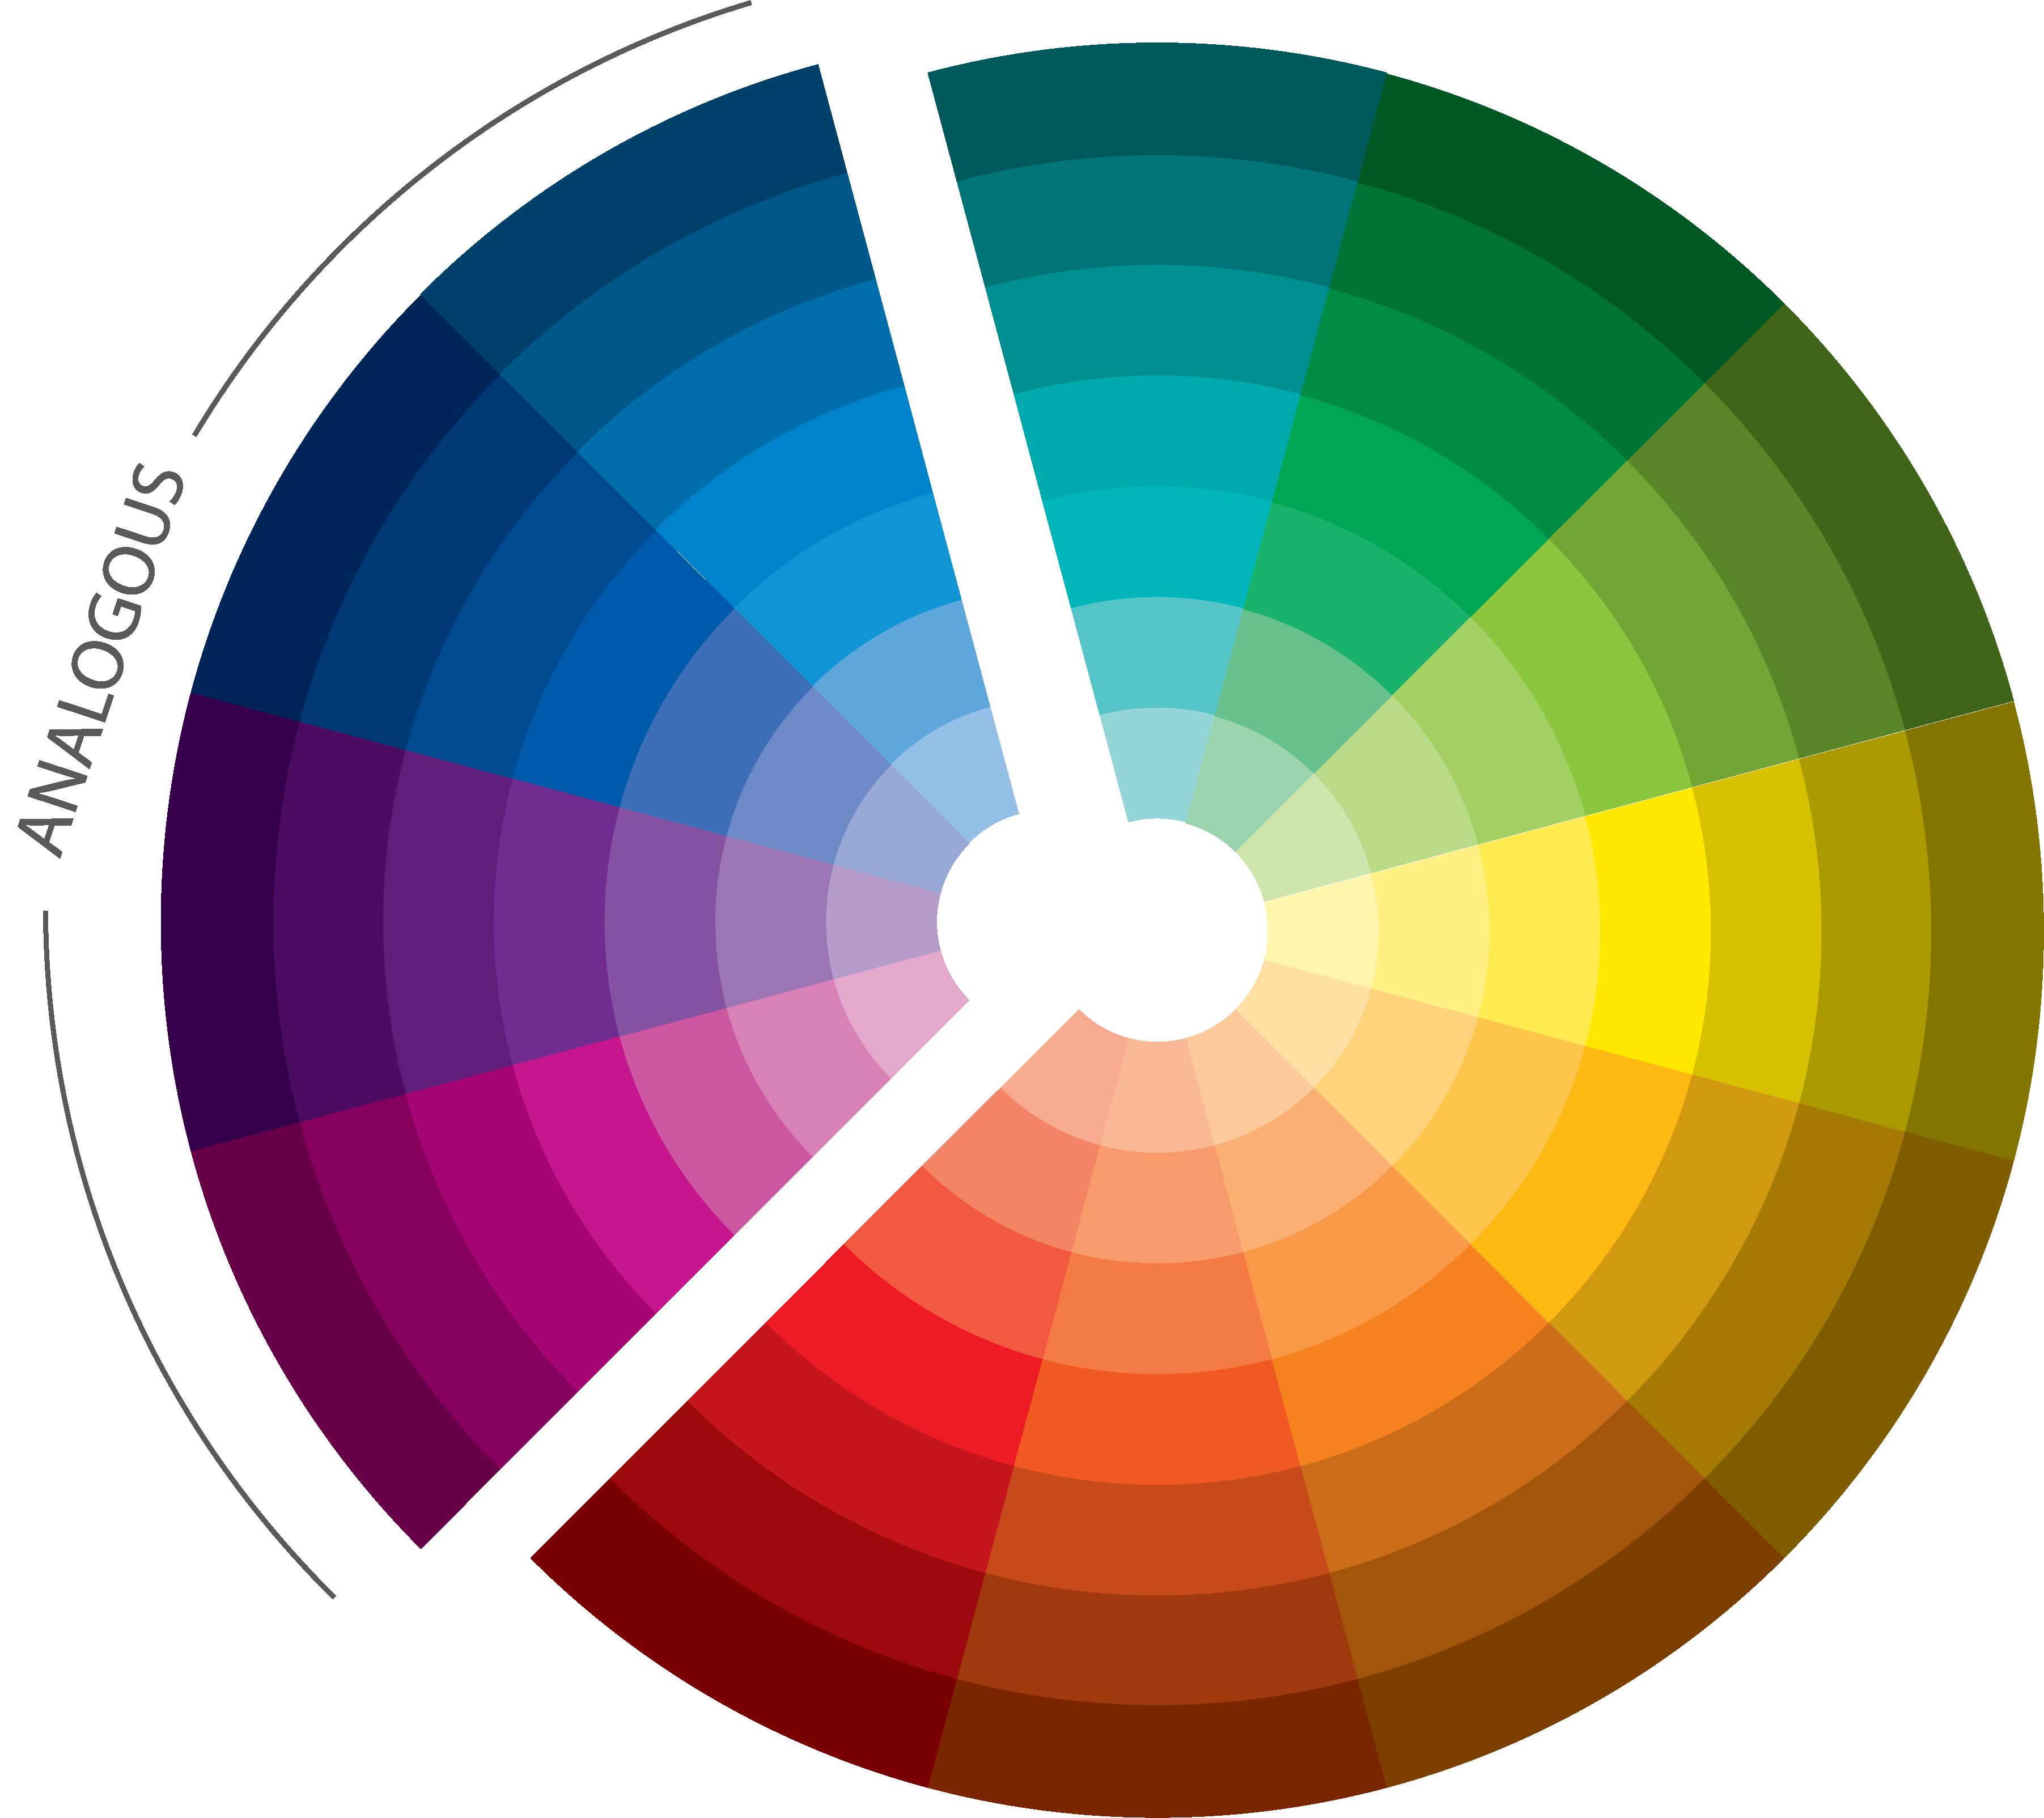 Analogous color